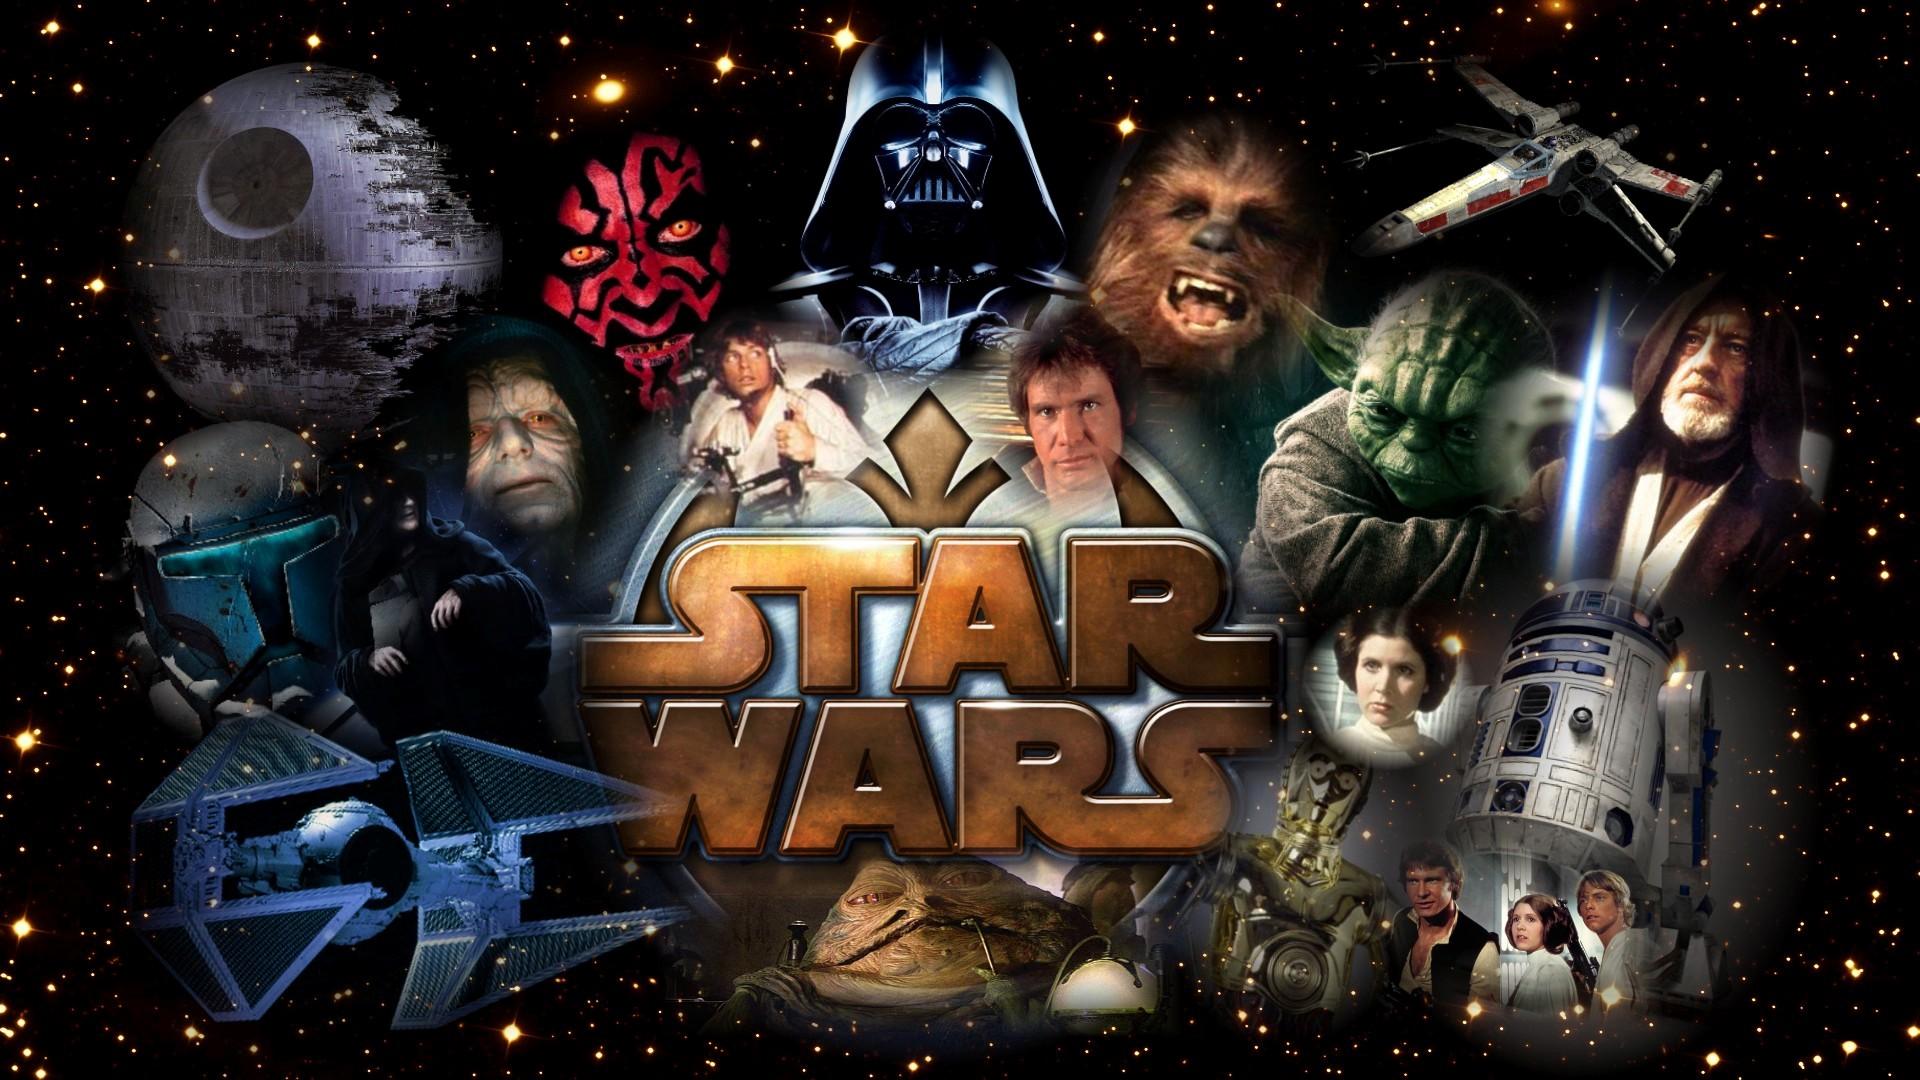 Banner Star Wars 13   1,00 x 0,70 no Elo7   Festa & Oferta (6AE2B1)